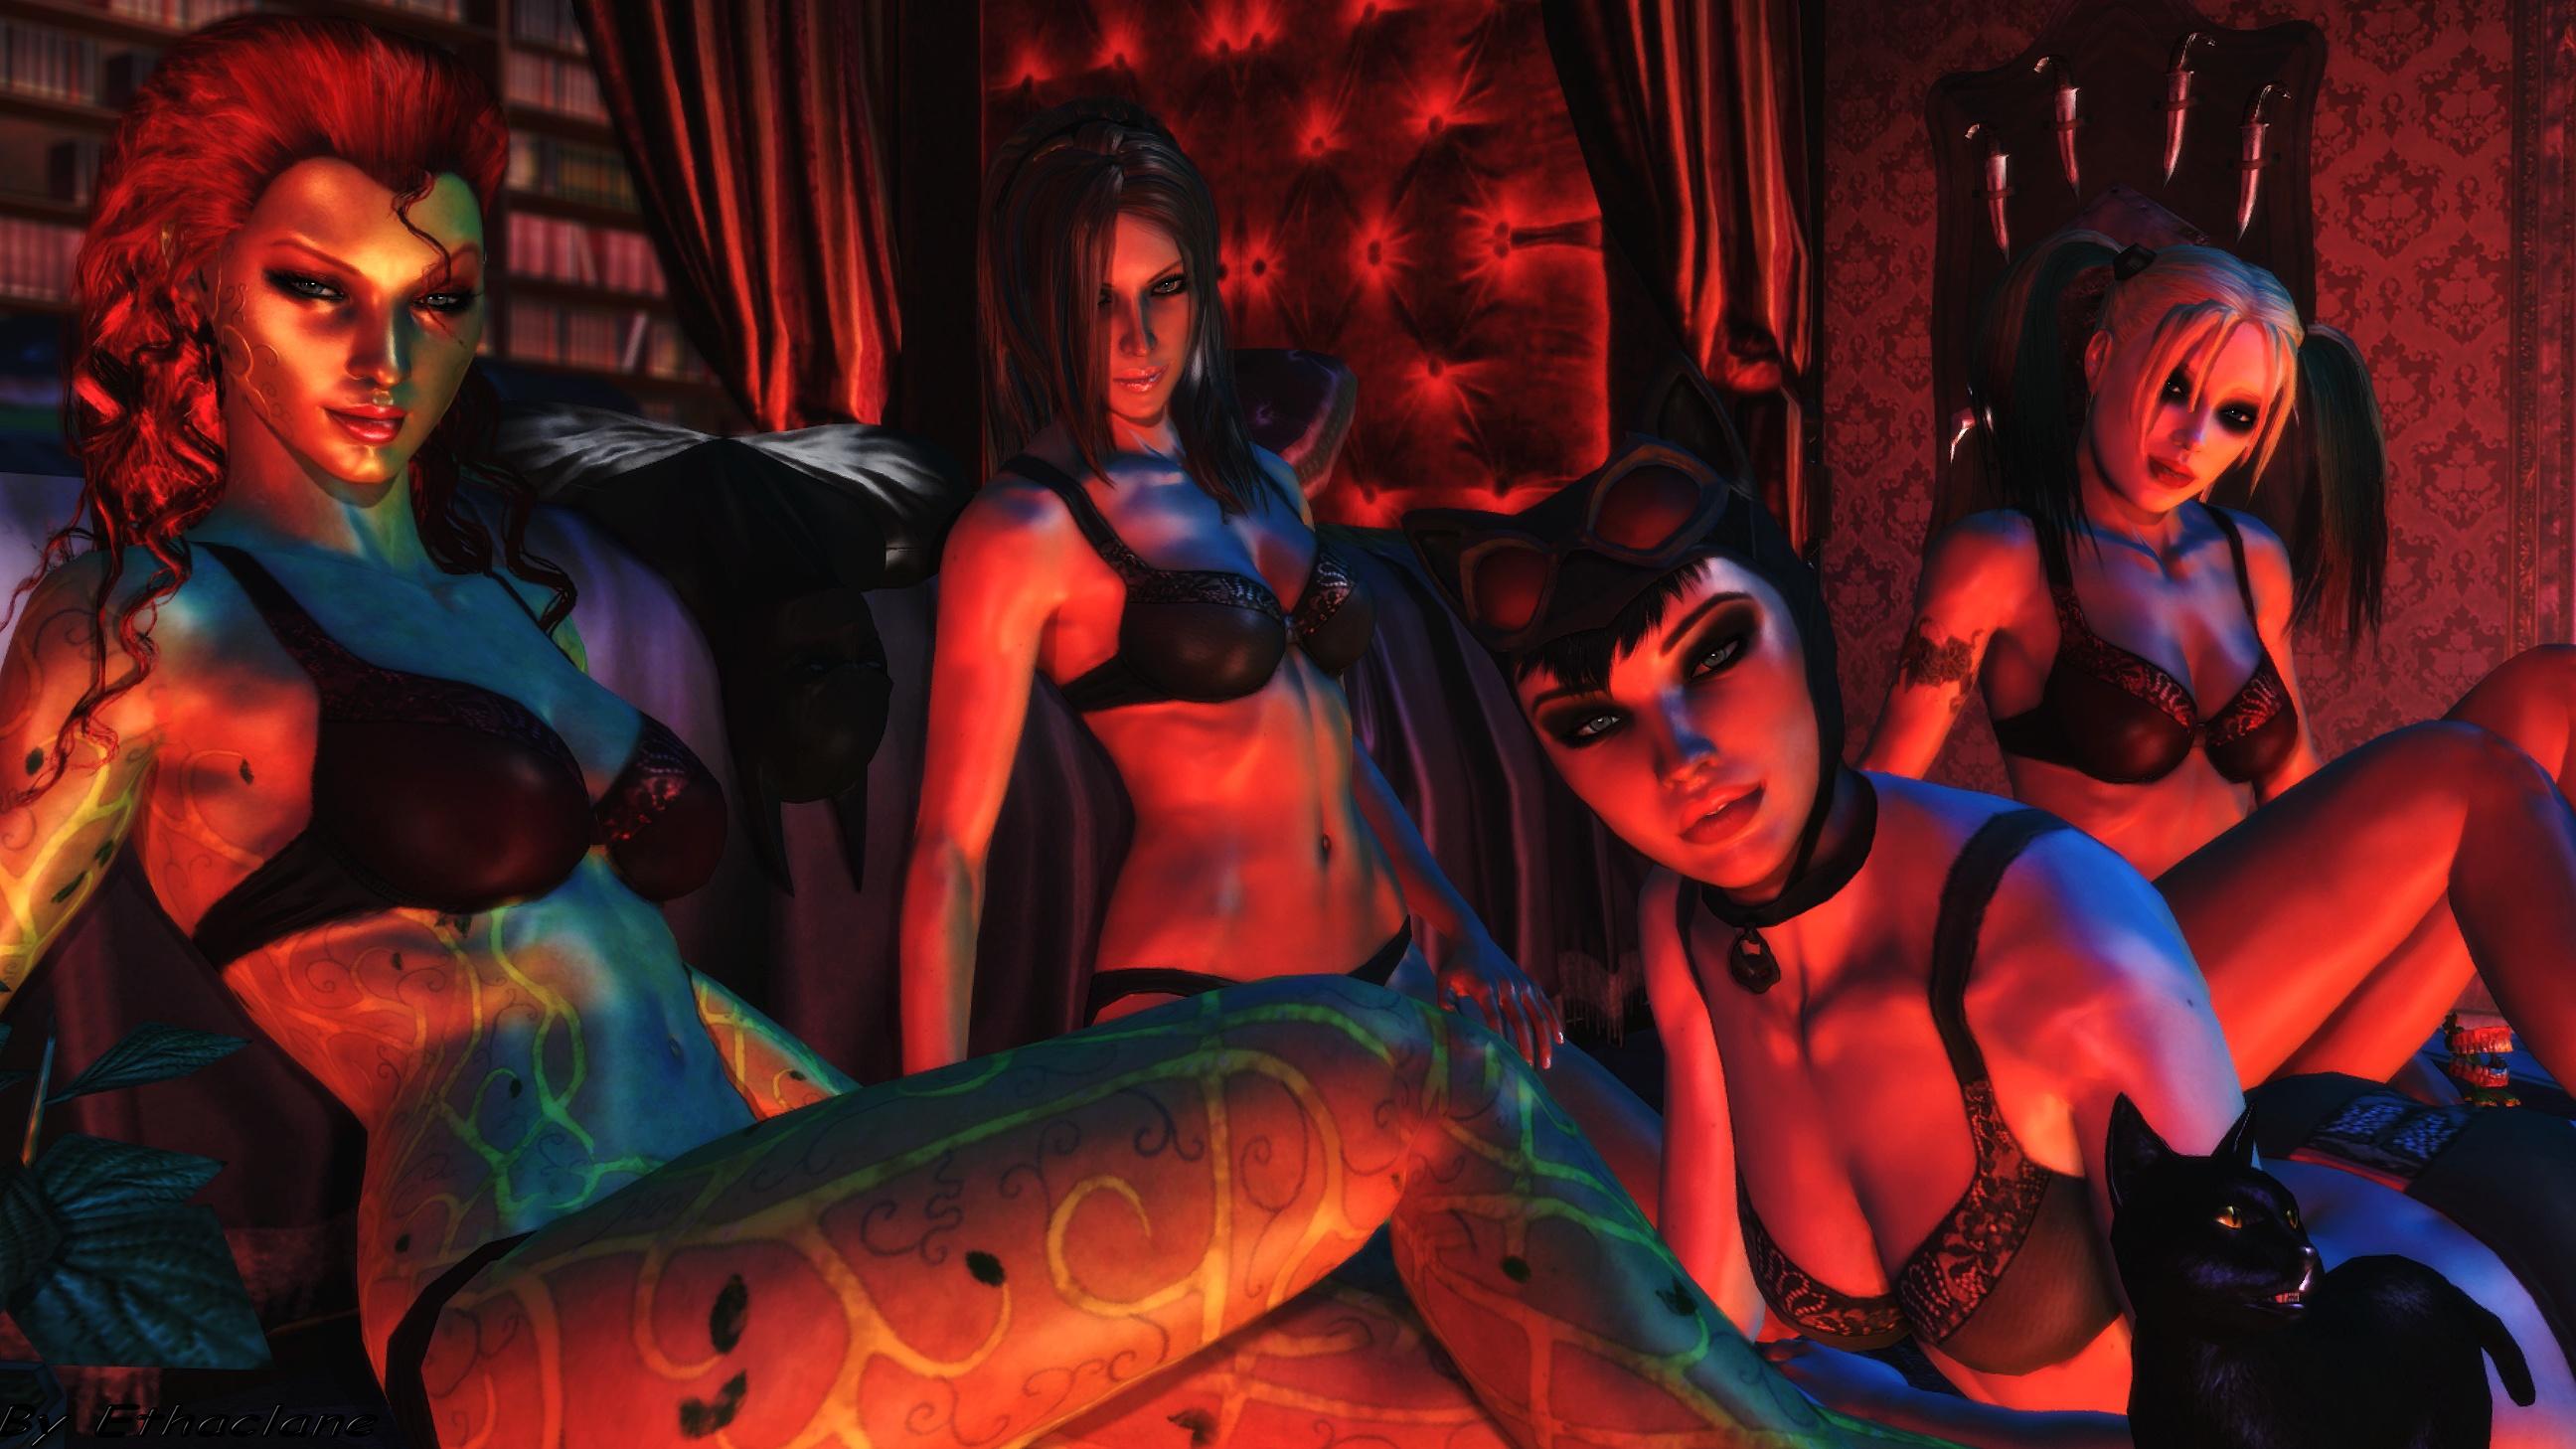 Batman Arkham City Wallpaper Arkham Hotties By Ethaclane On